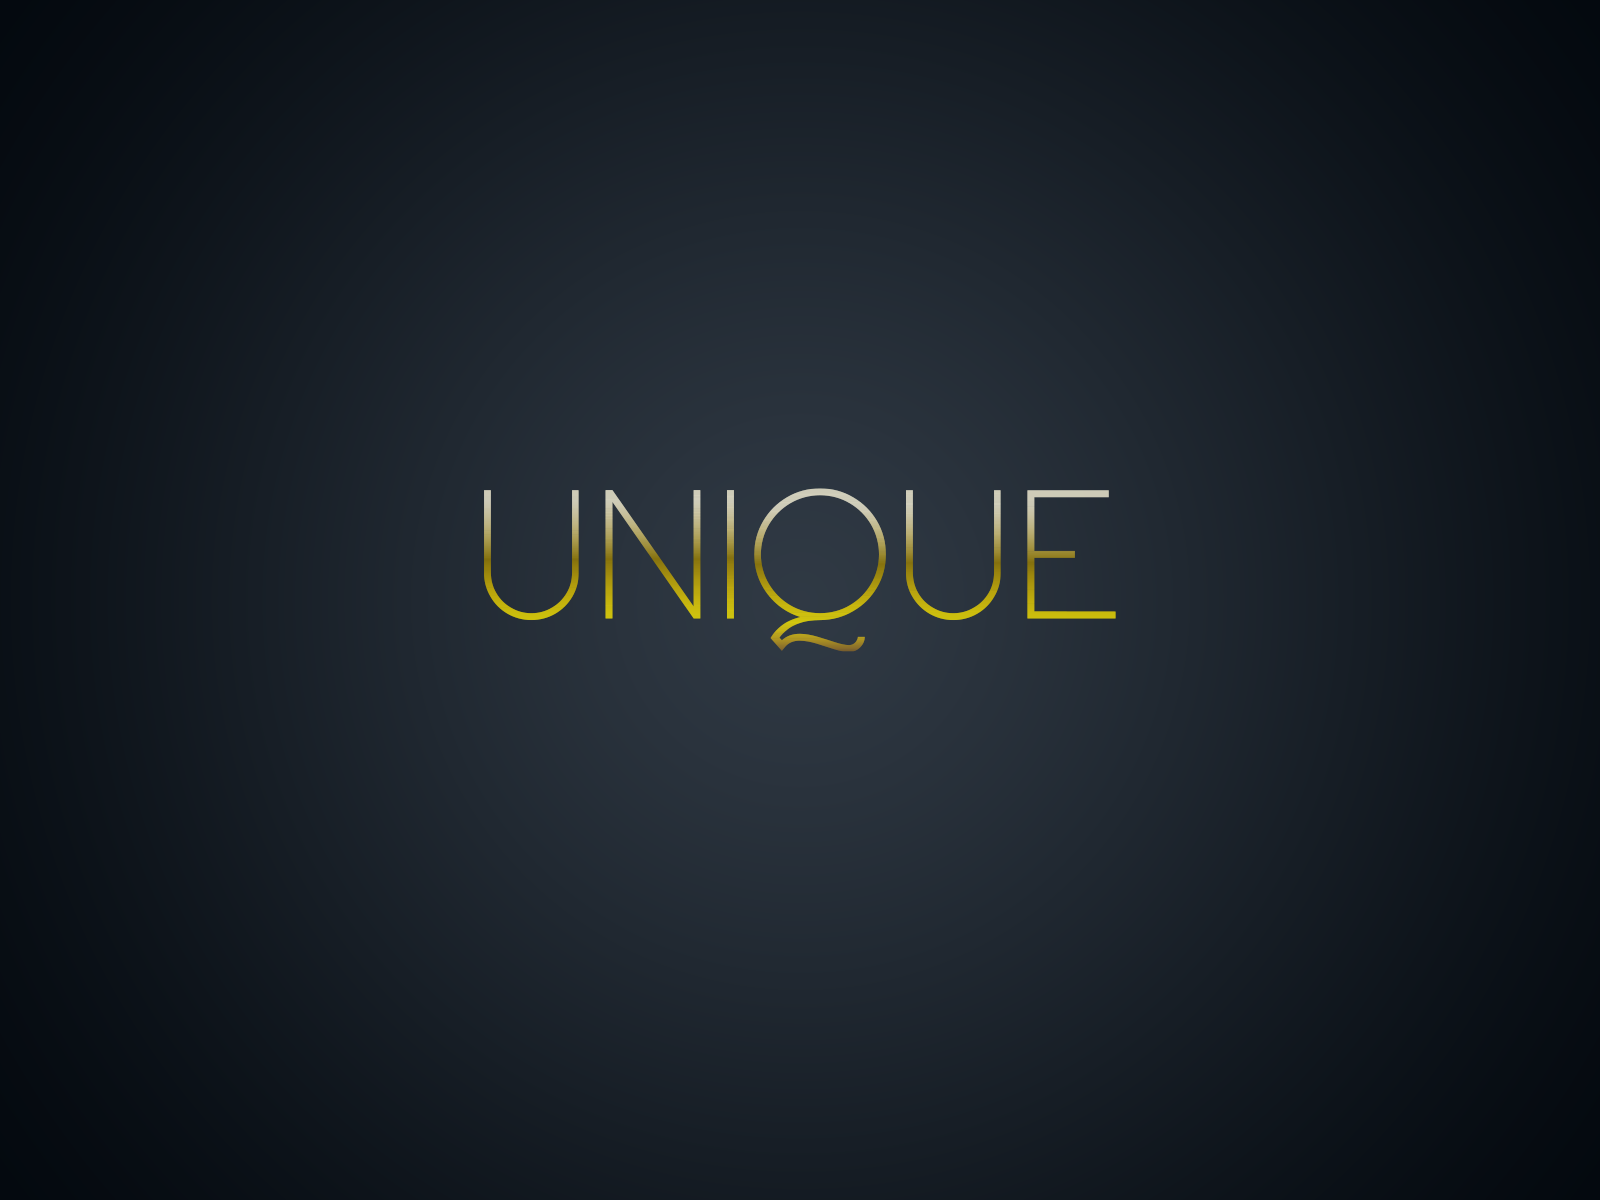 Unique Logotype / concept